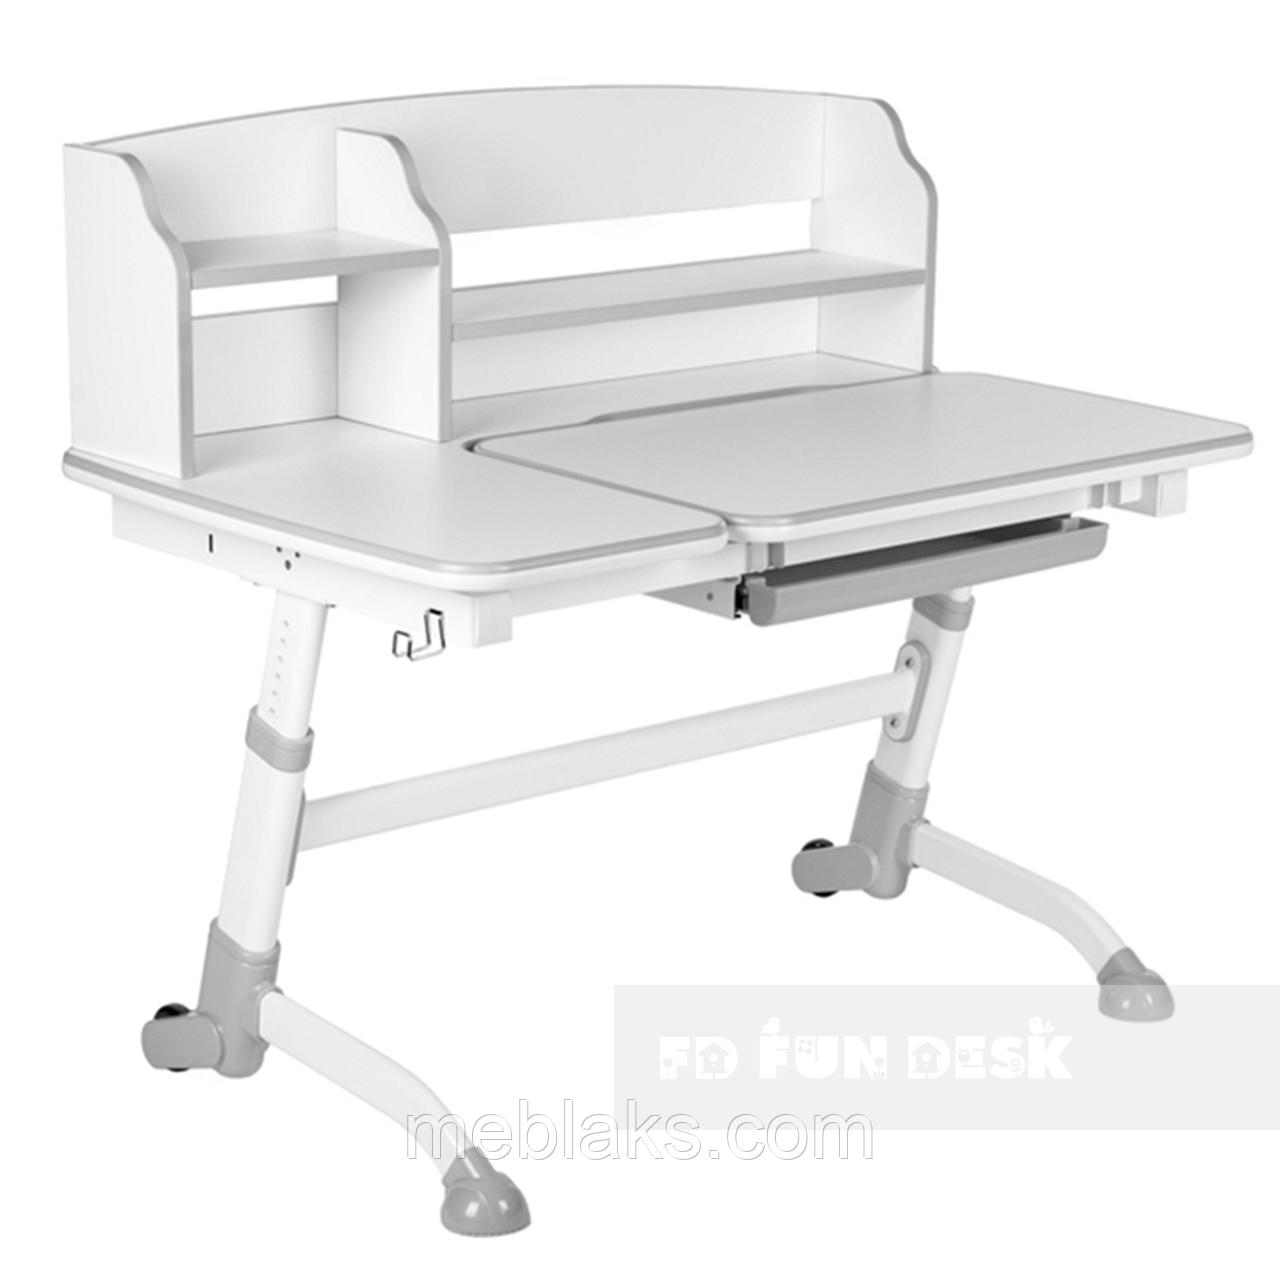 Стол-парта трансформердля дома FunDesk Amare II Grey